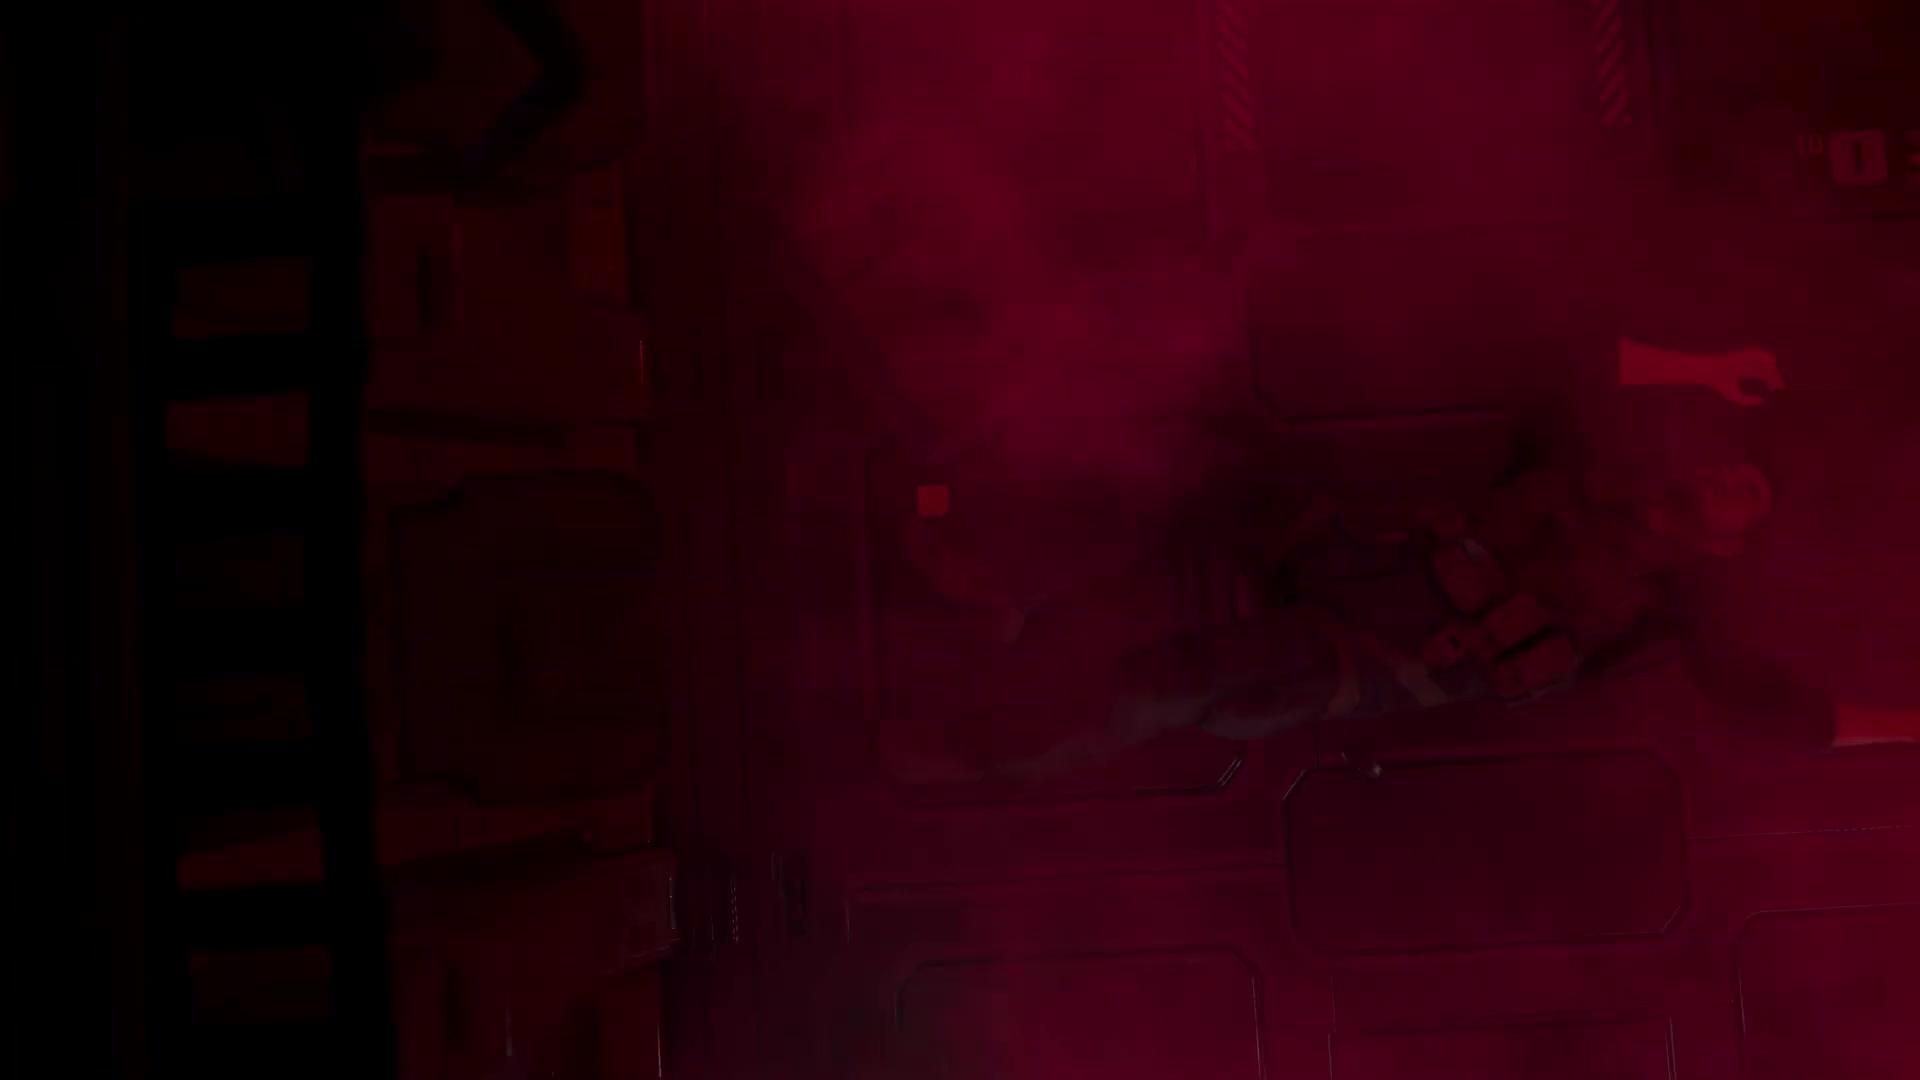 Halo Infinite - E3 2019 - Discover Hope [HD] screen capture